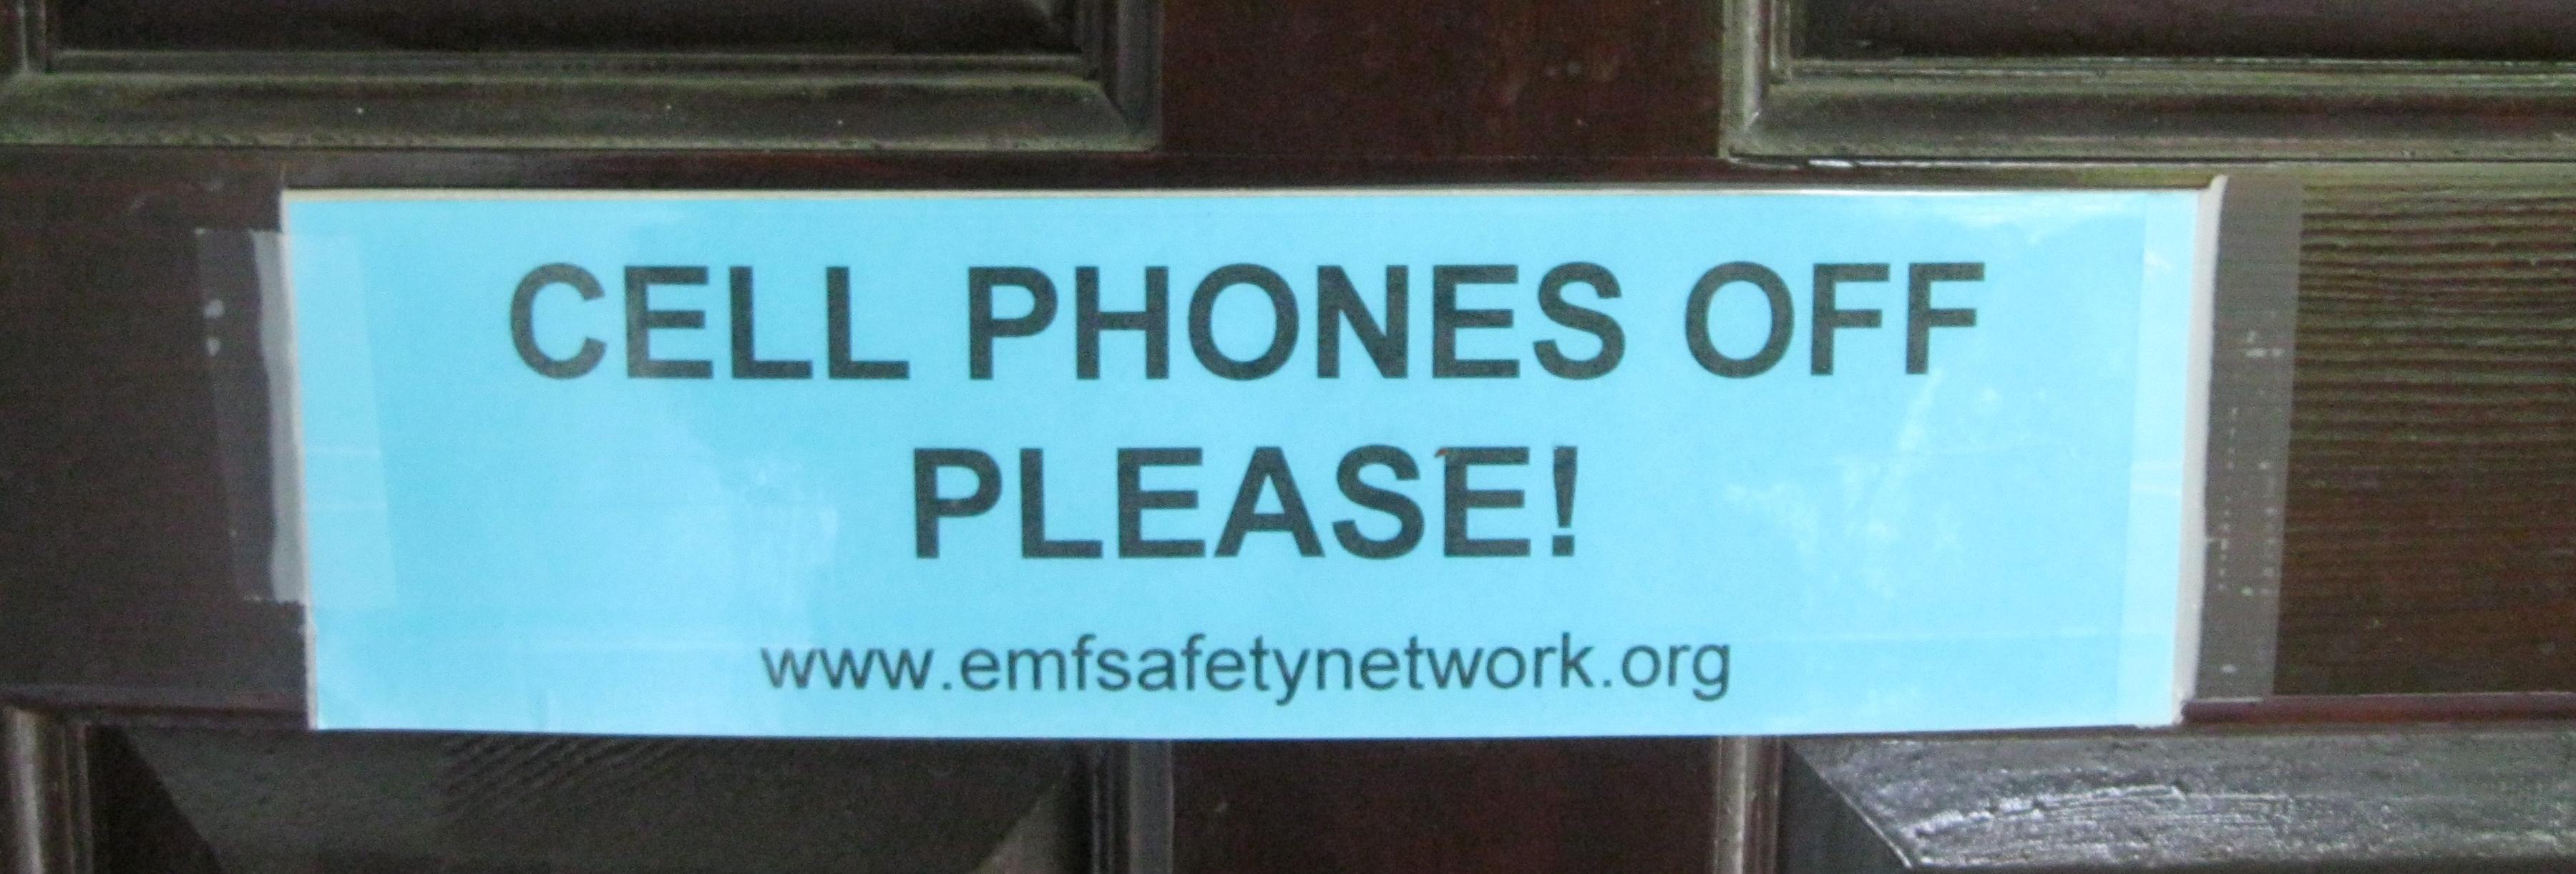 Electromagnetic Hypersensitivity (EHS) – EMF Safety Network